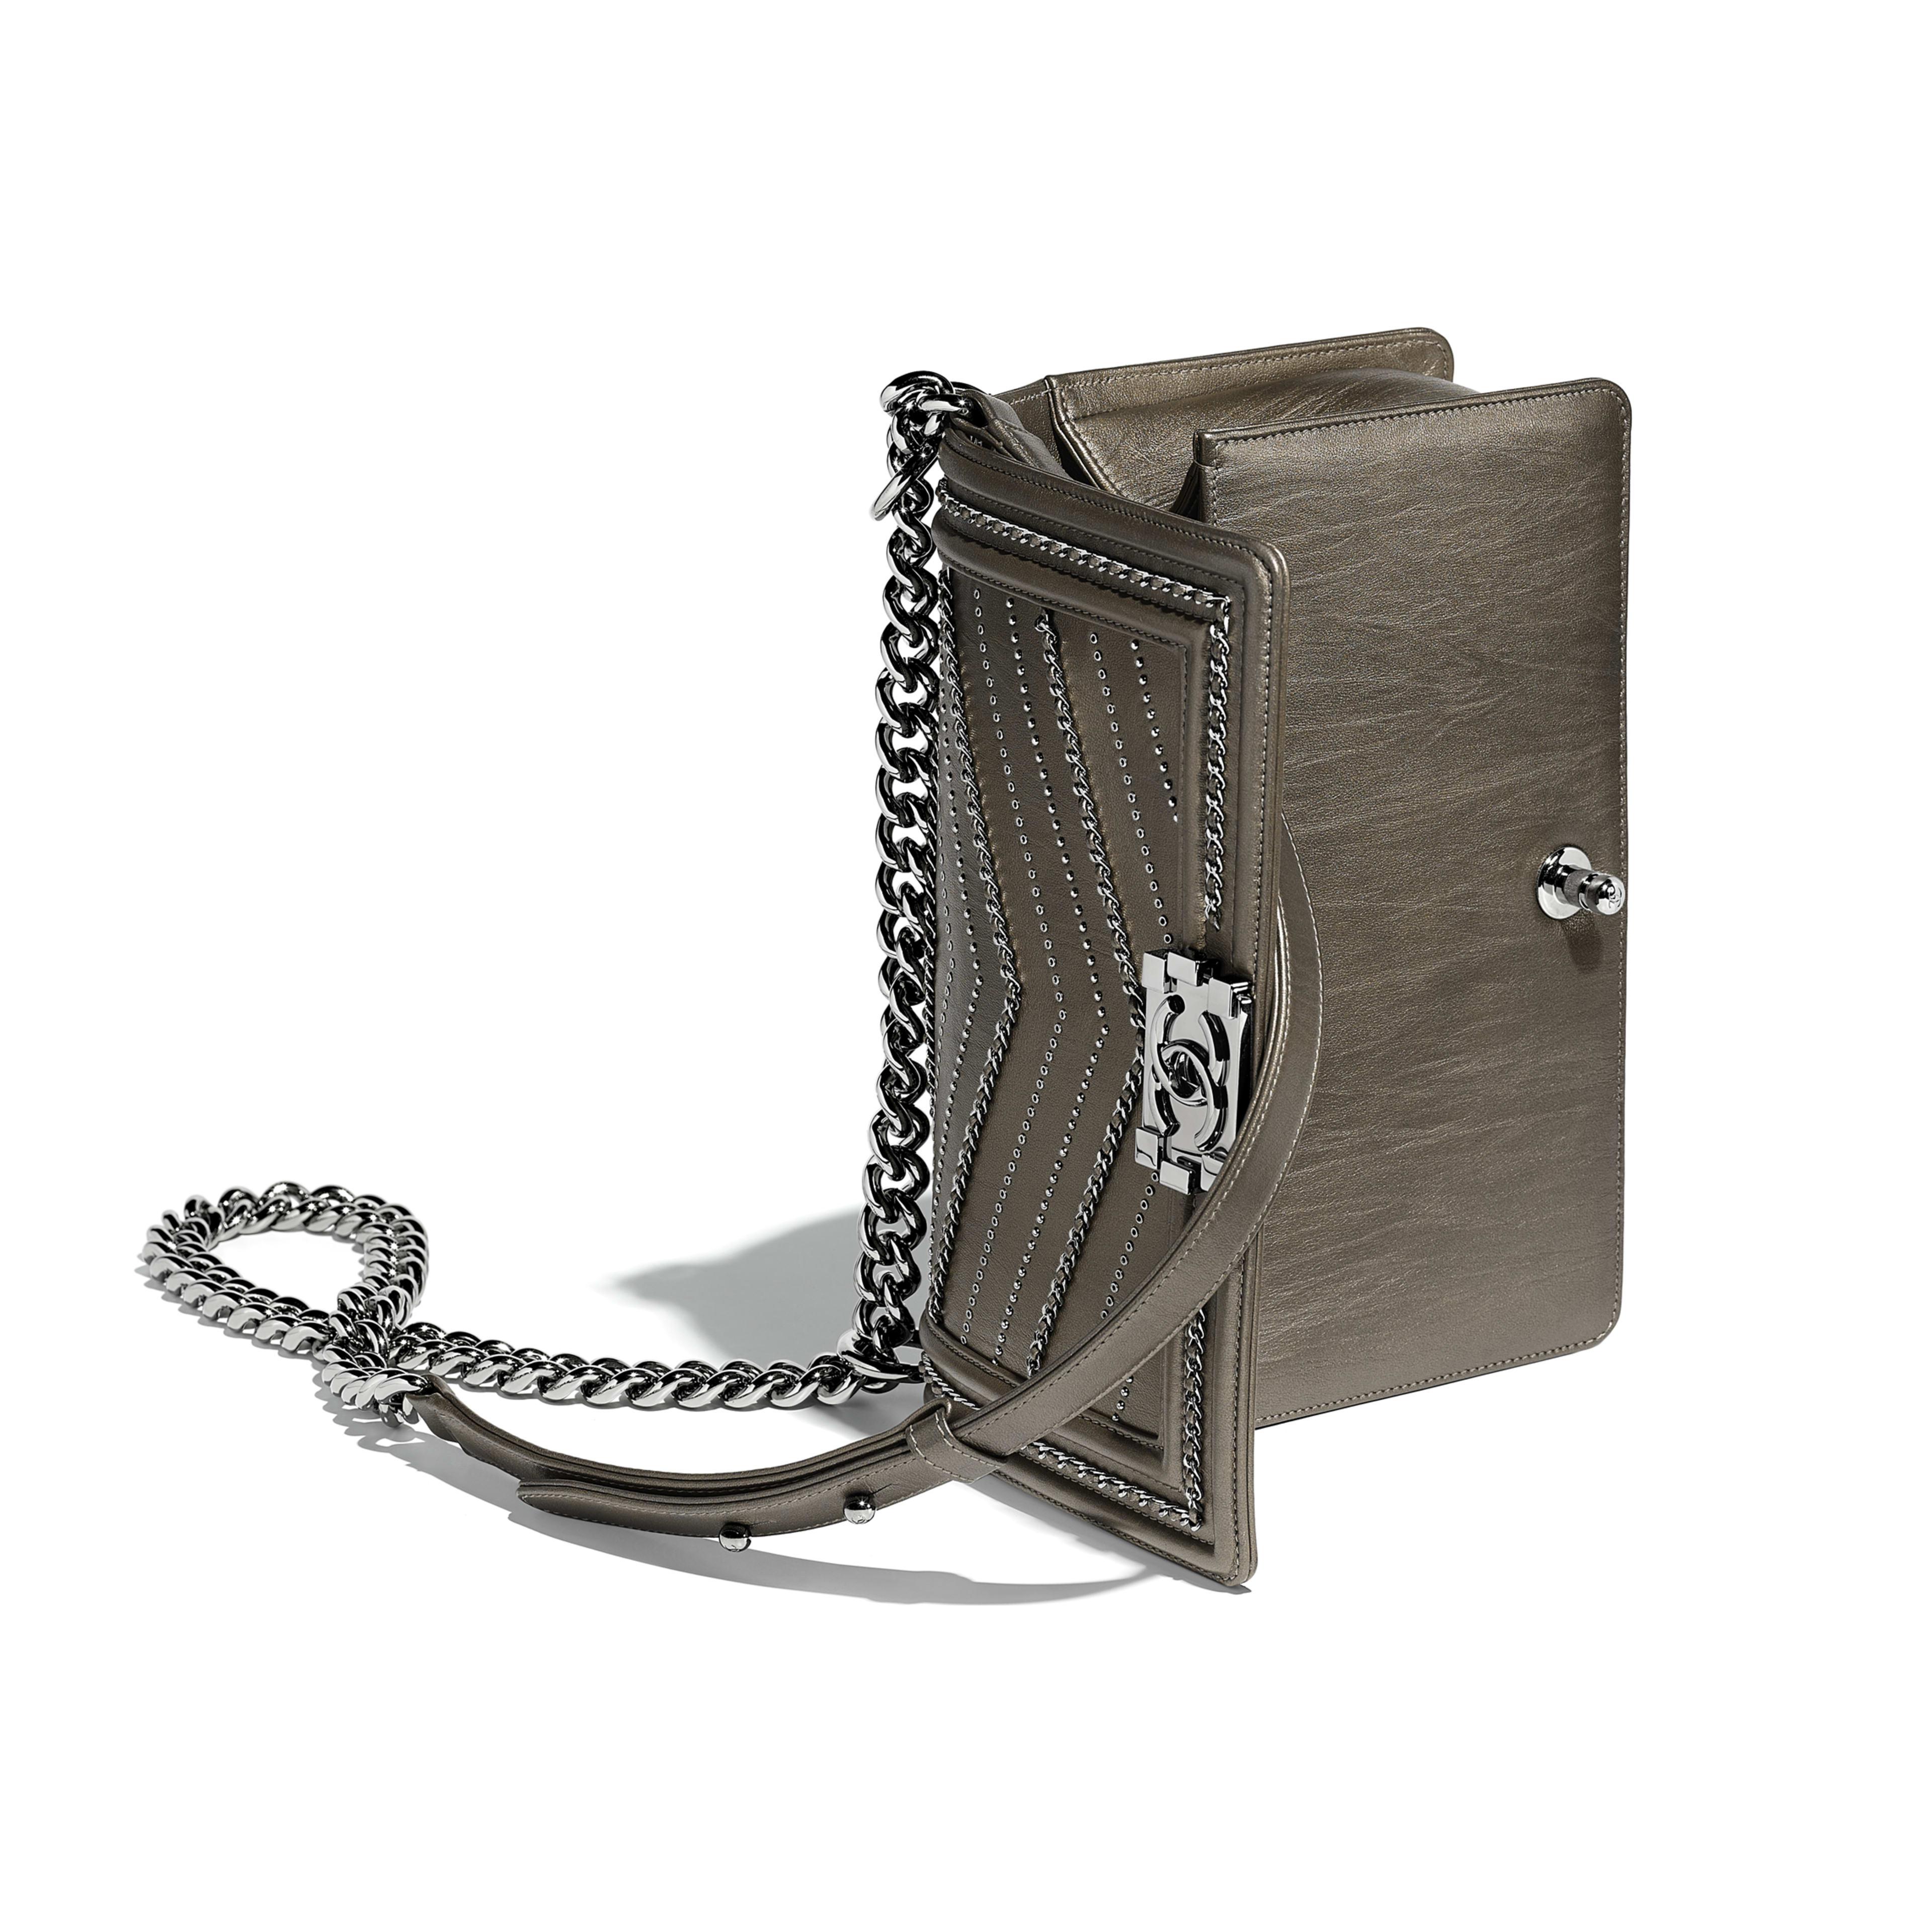 BOY CHANEL Handbag - Silver - Metallic Crumpled Calfskin & Ruthenium-Finish Metal - Other view - see full sized version